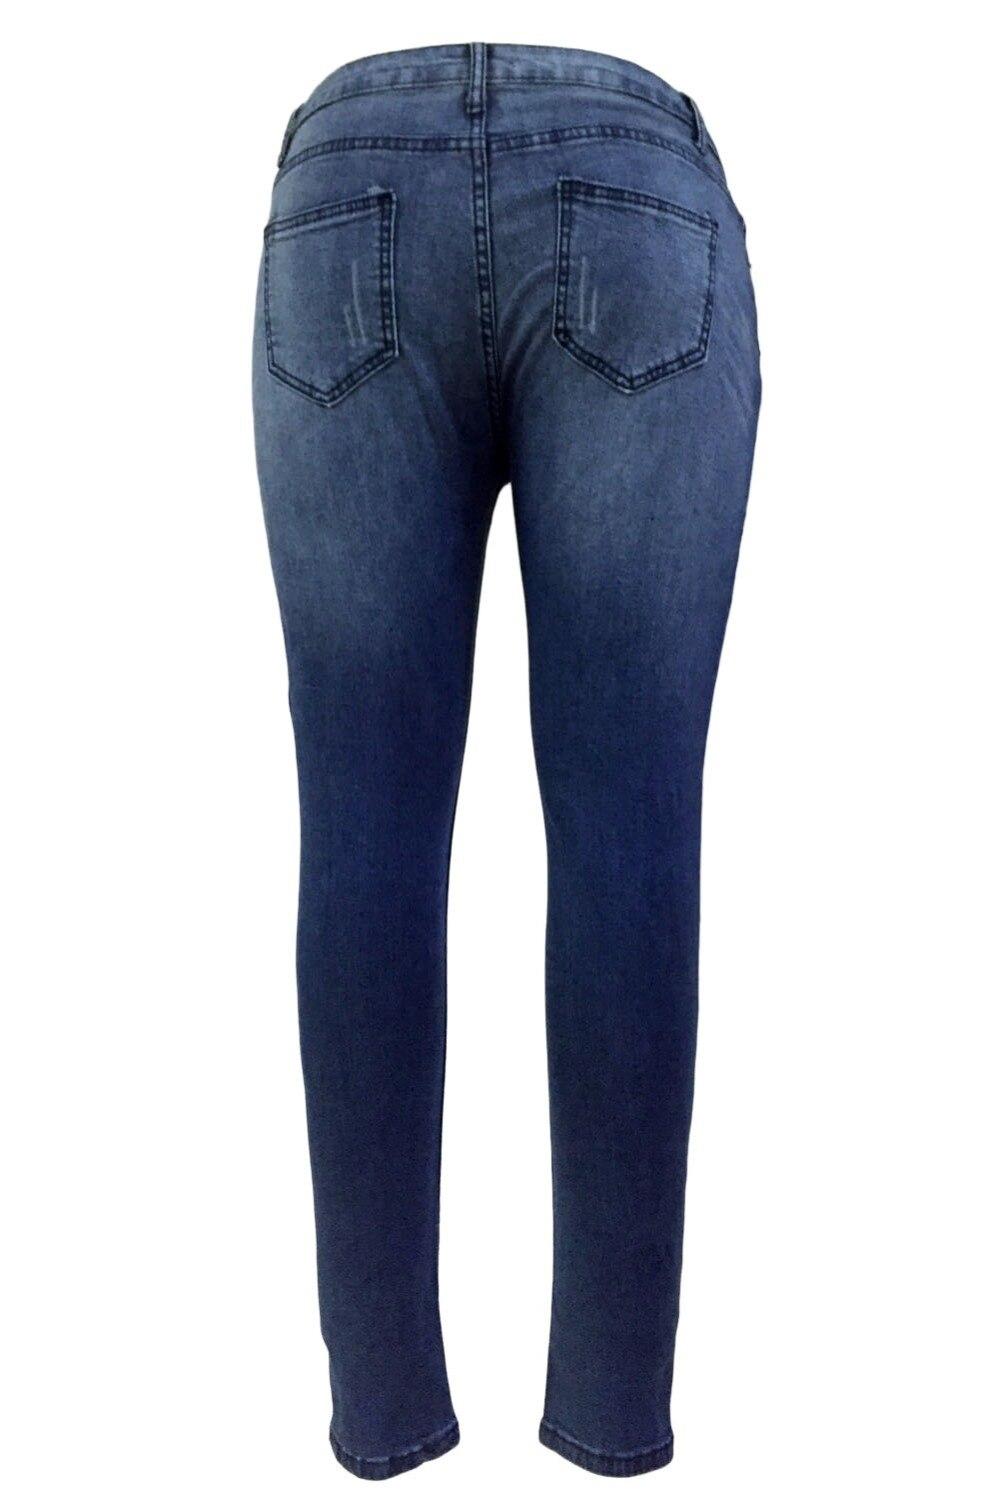 Dark-Sandblast-Wash-Denim-Destroyed-Skinny-Jeans-LC78659-5-4